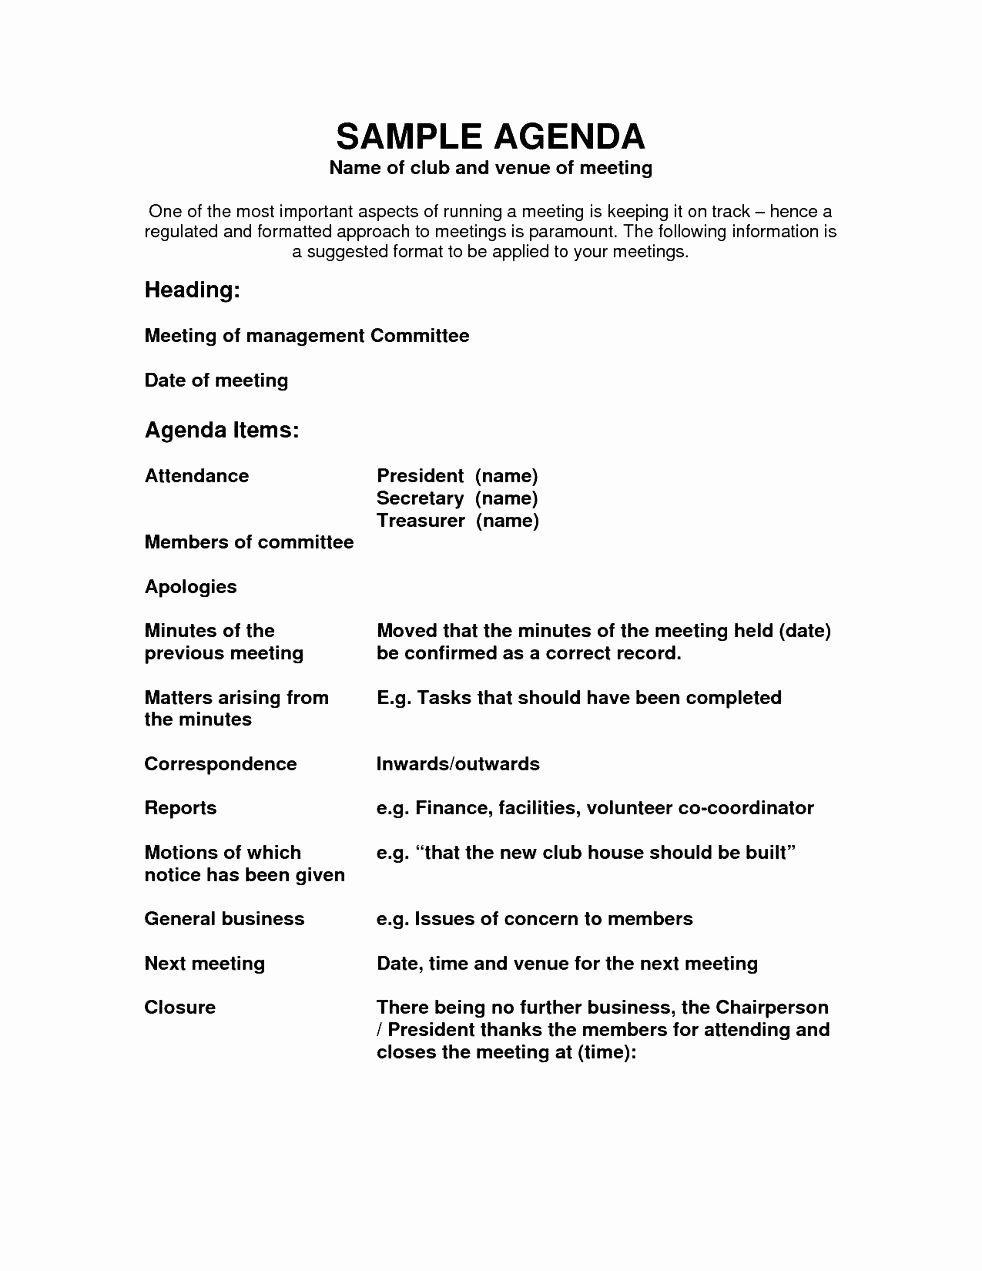 Sample Agenda Template for Meetings Best Of Agenda Template Word Example Mughals